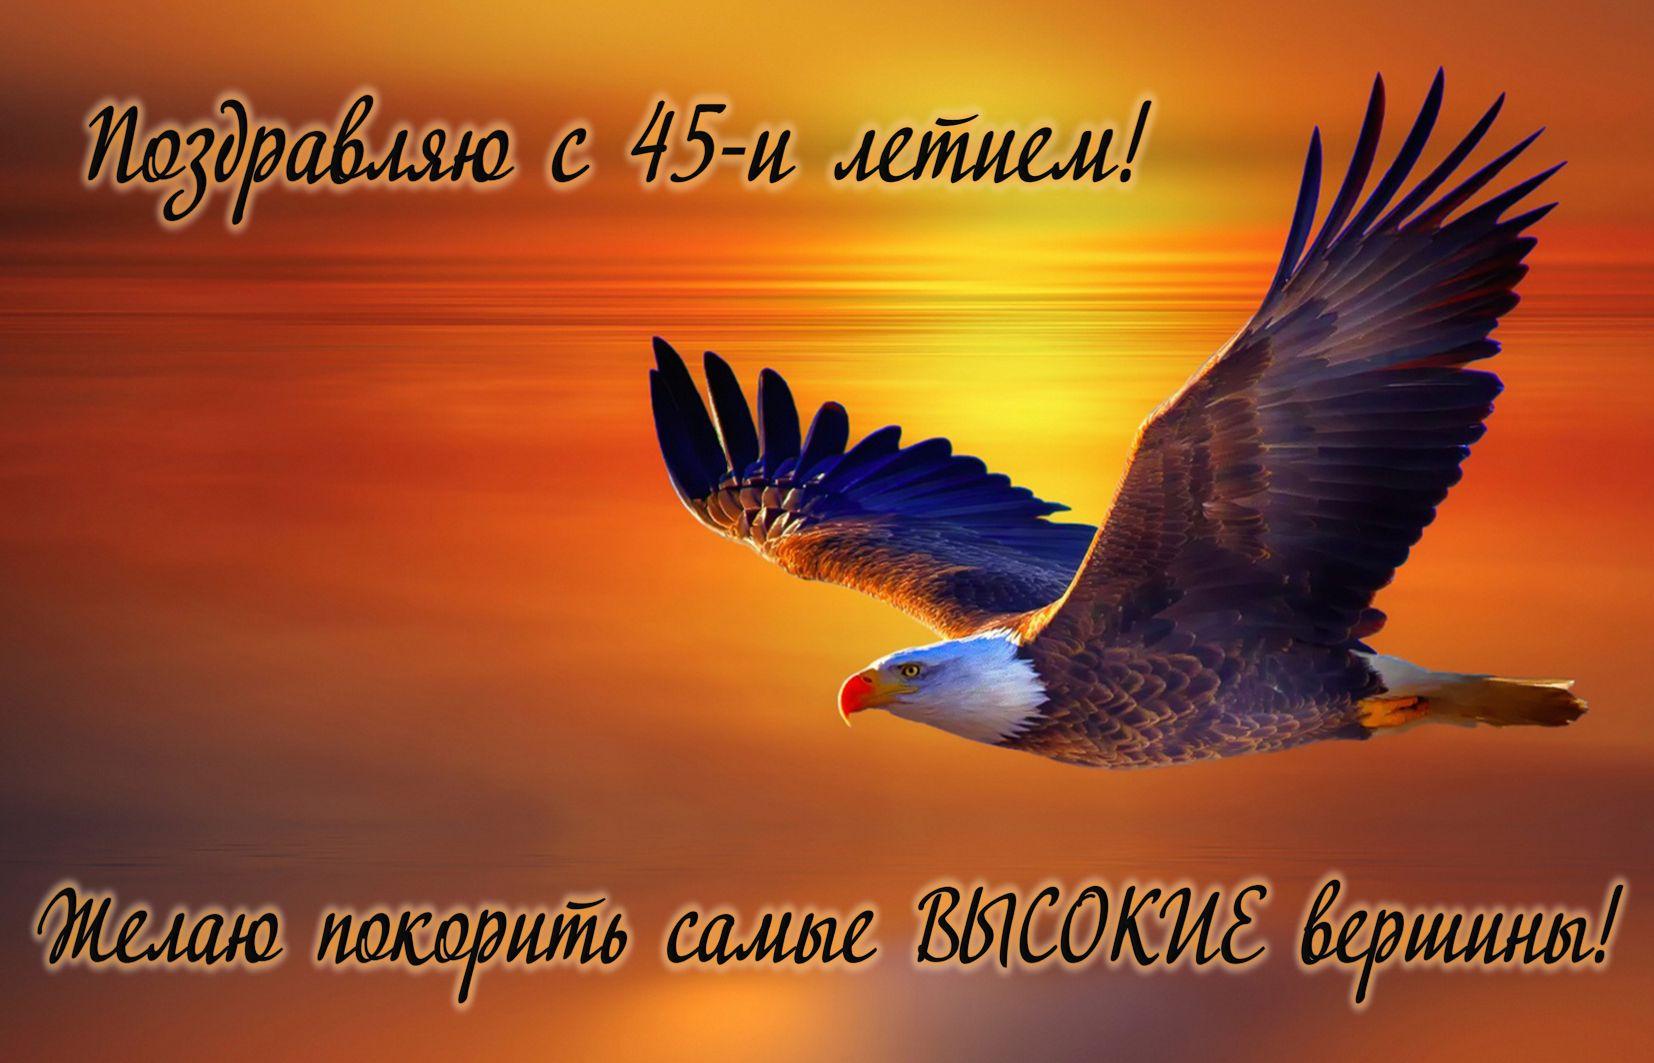 Открытка на юбилей 45 лет - парящий орел на фоне золотистого заката